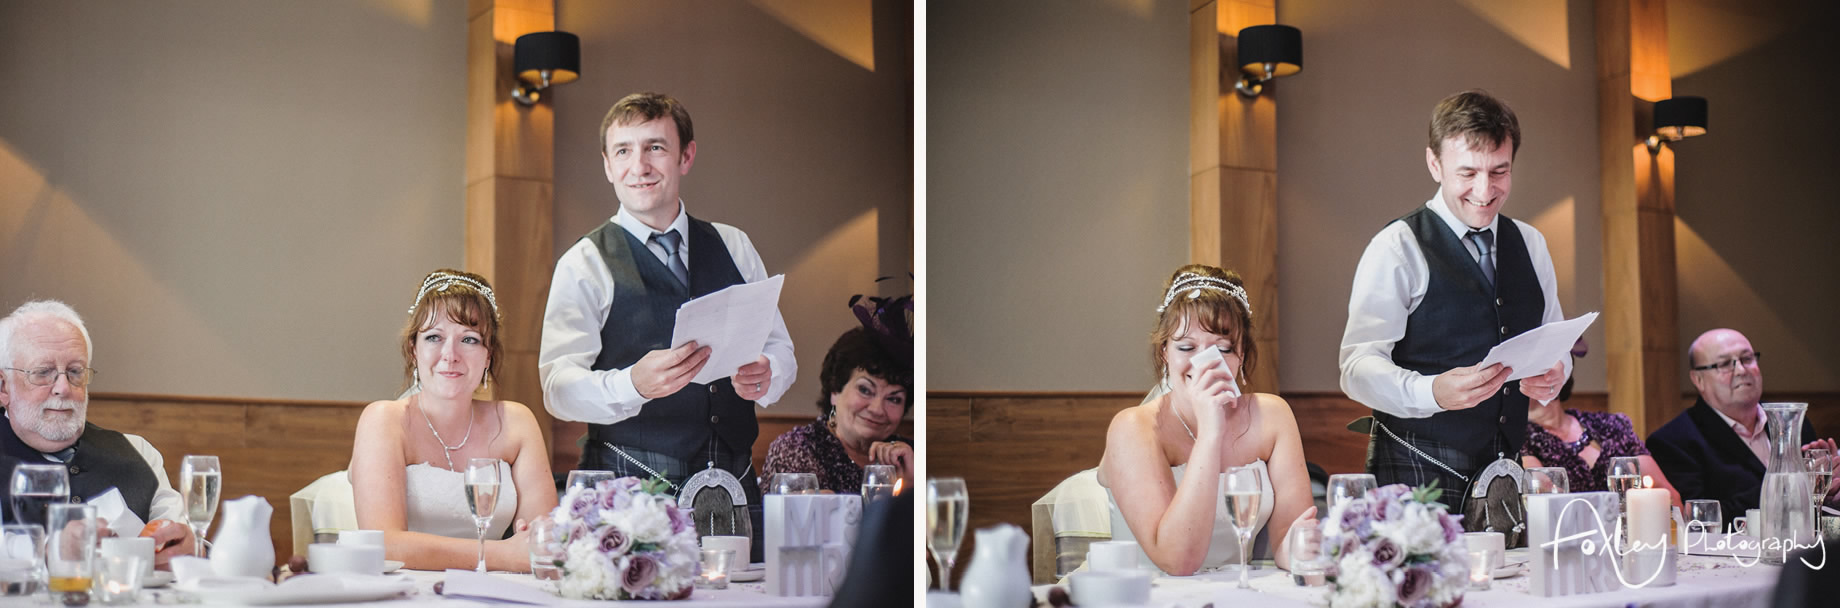 Alys-And-Davids-Wedding-Loch-Lomond-143